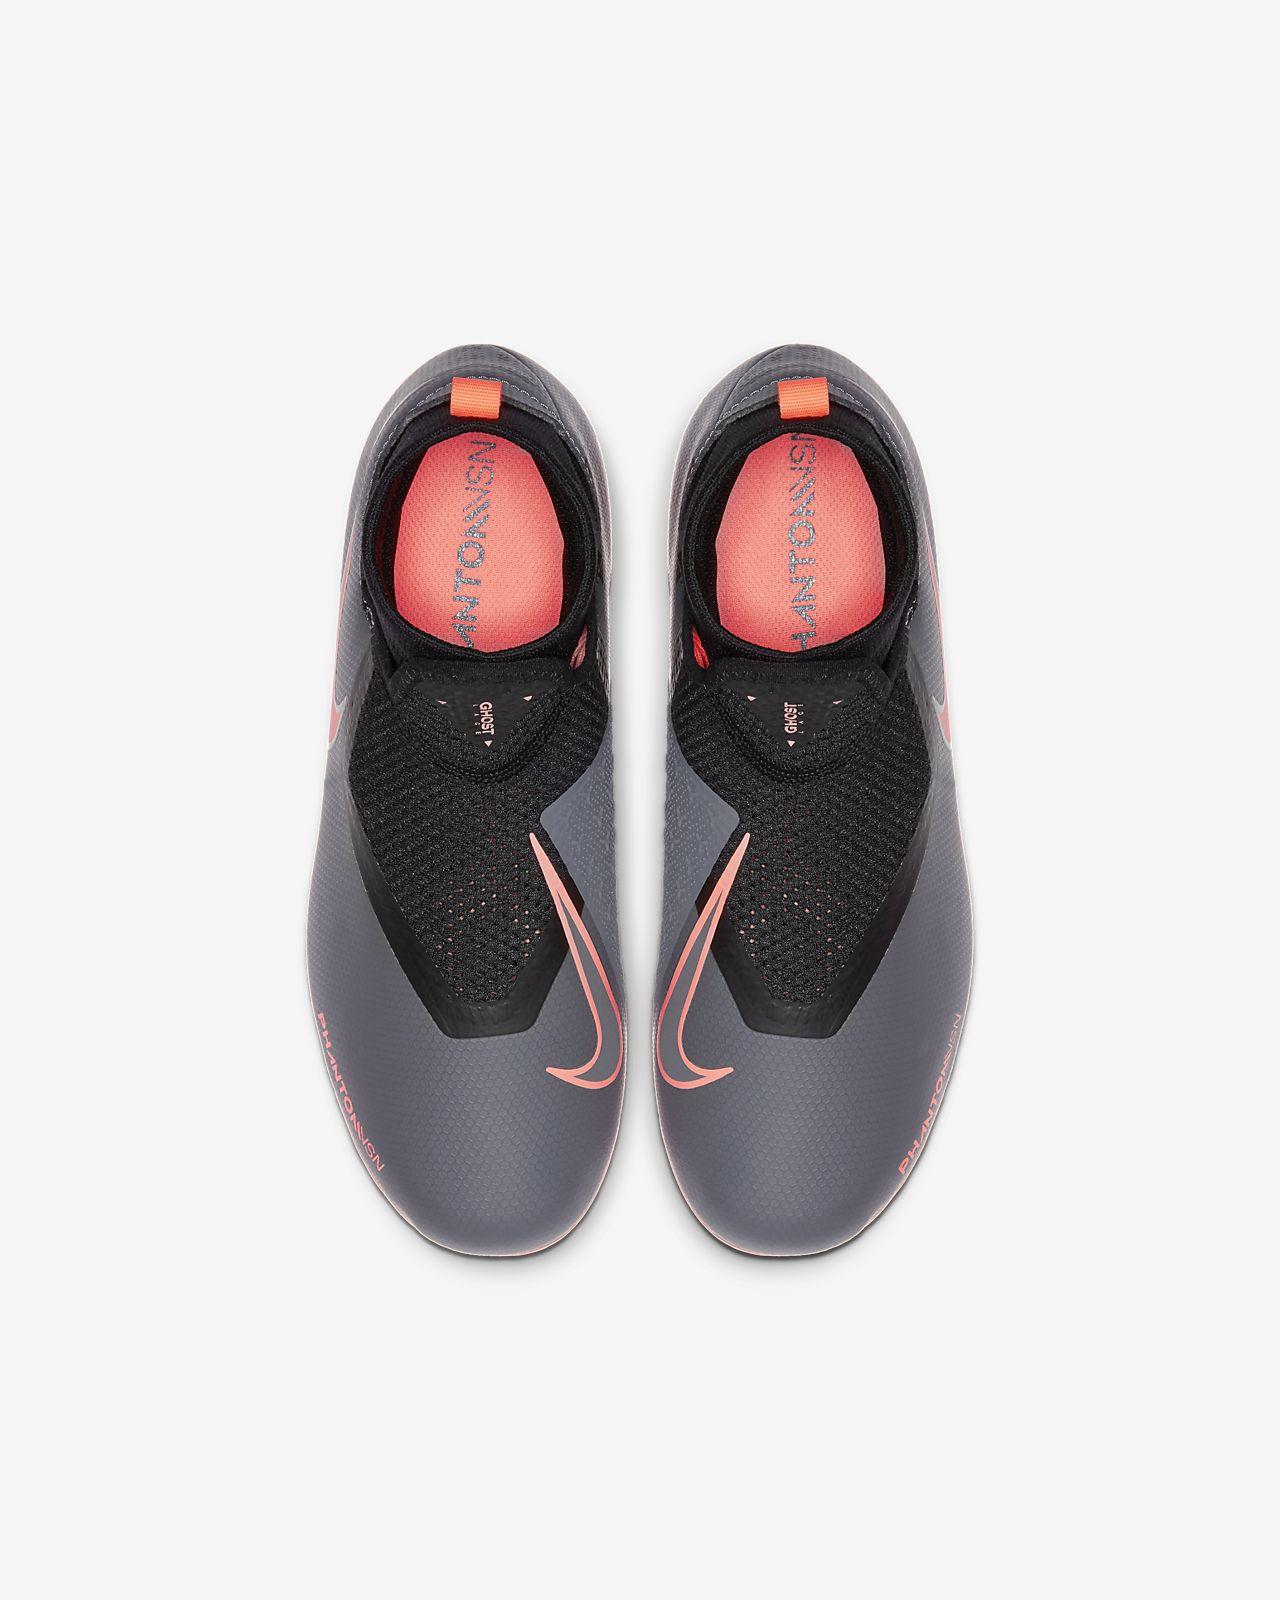 Nike Phantom VSN Academy DF engins fixes//MG Homme